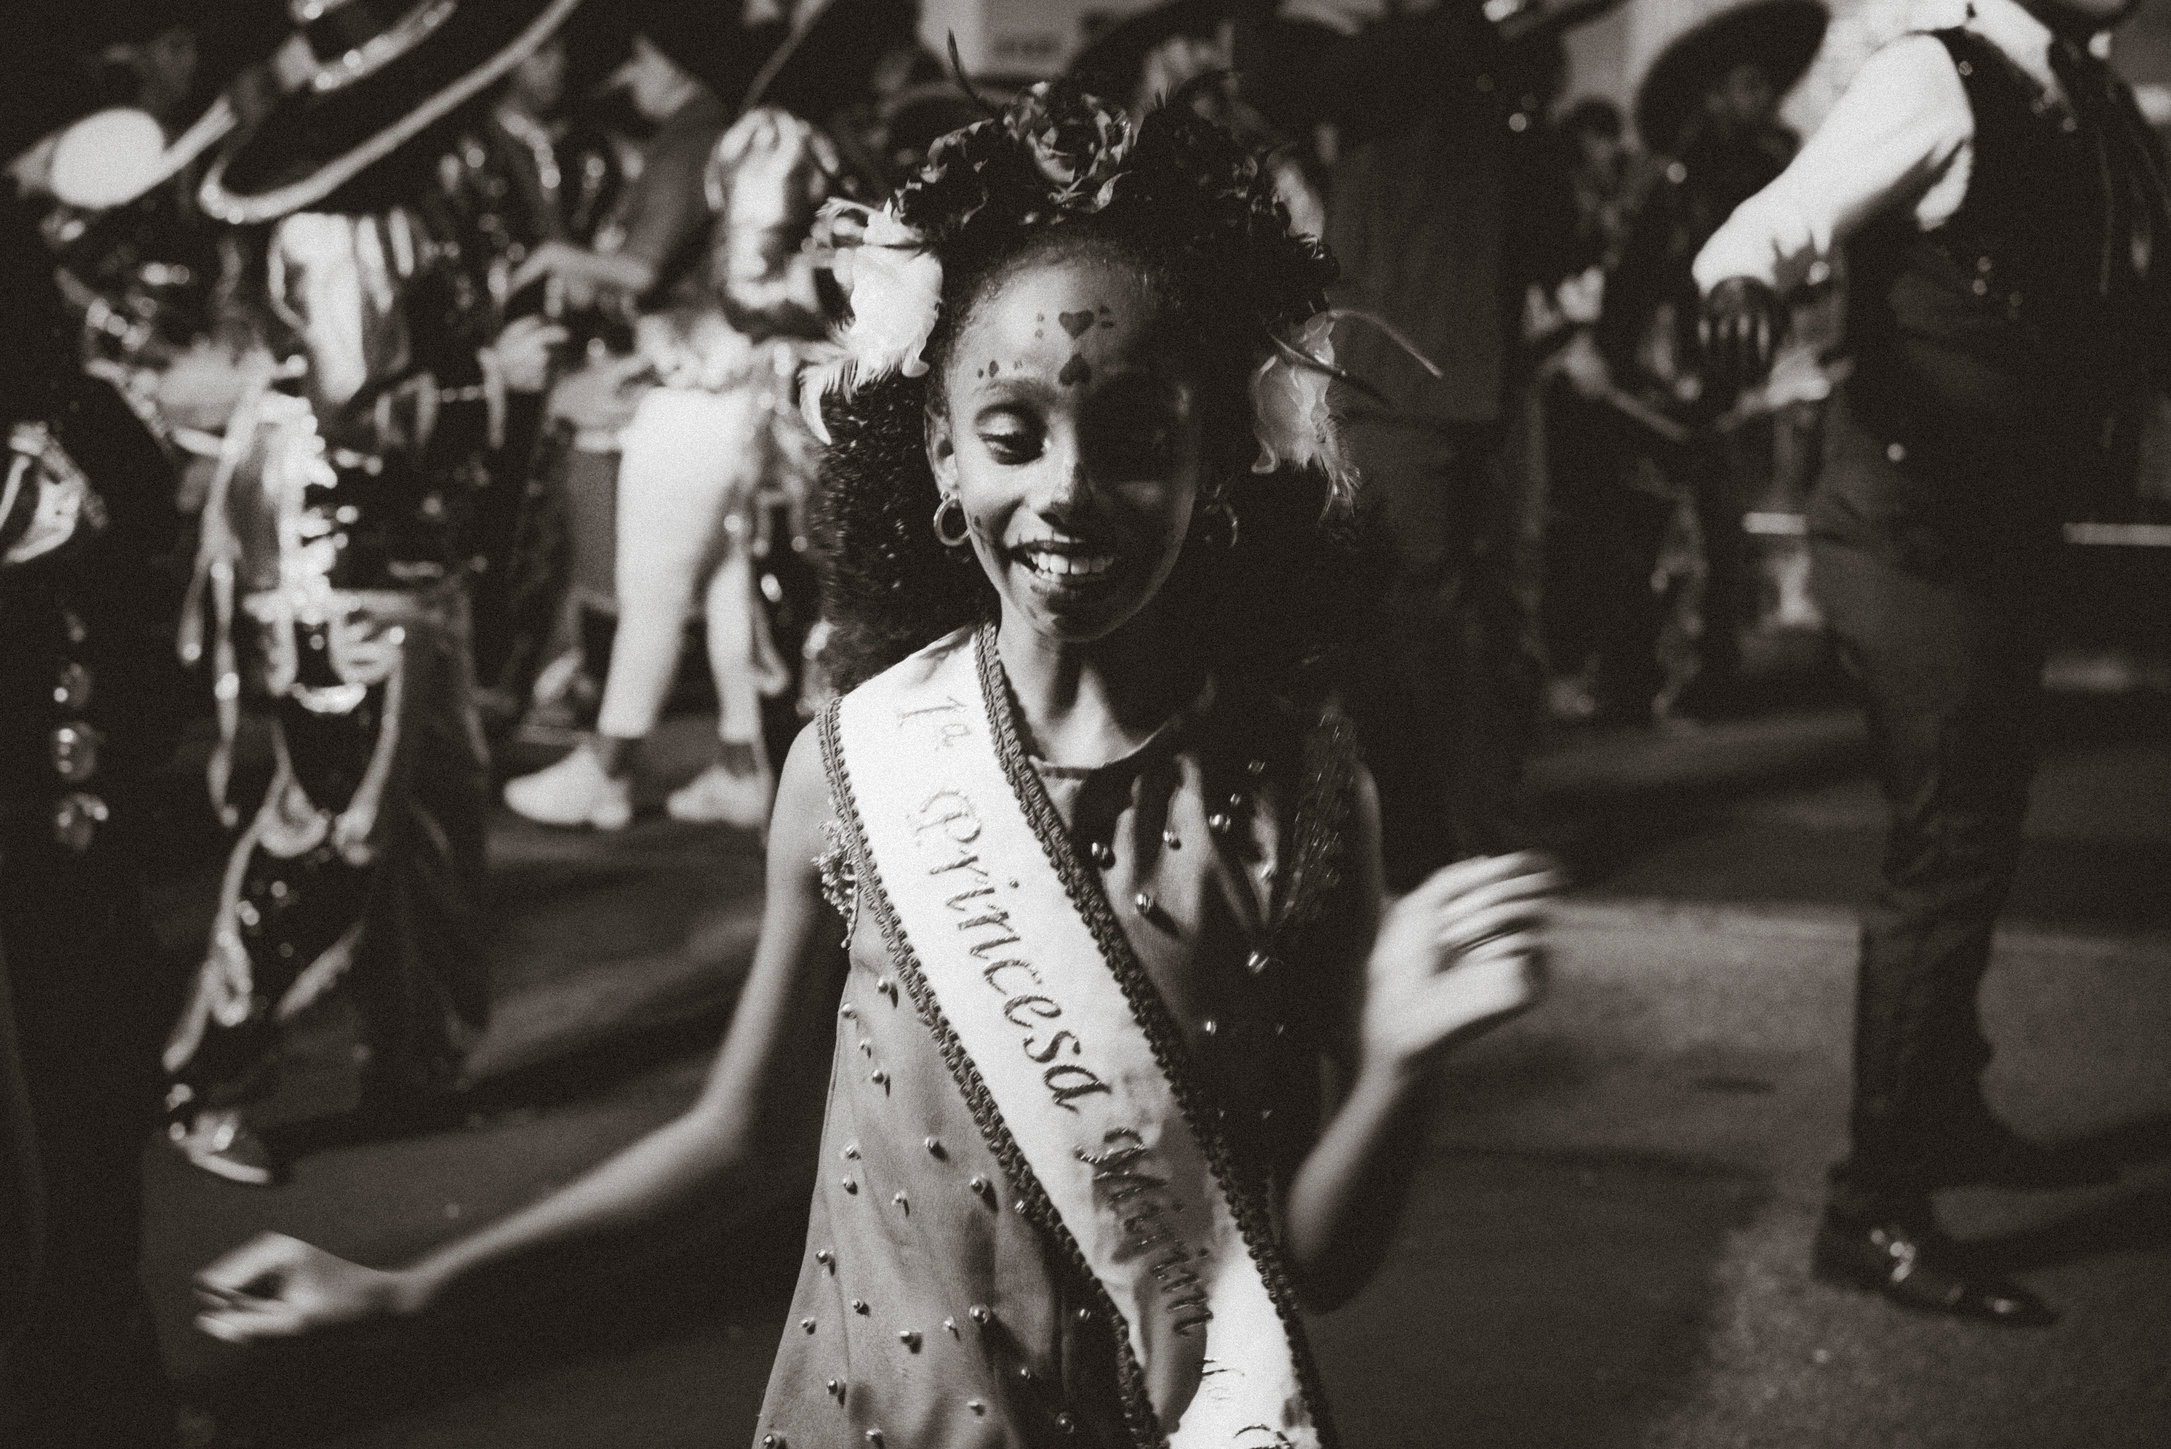 20190304-Carneval2019-114.jpg